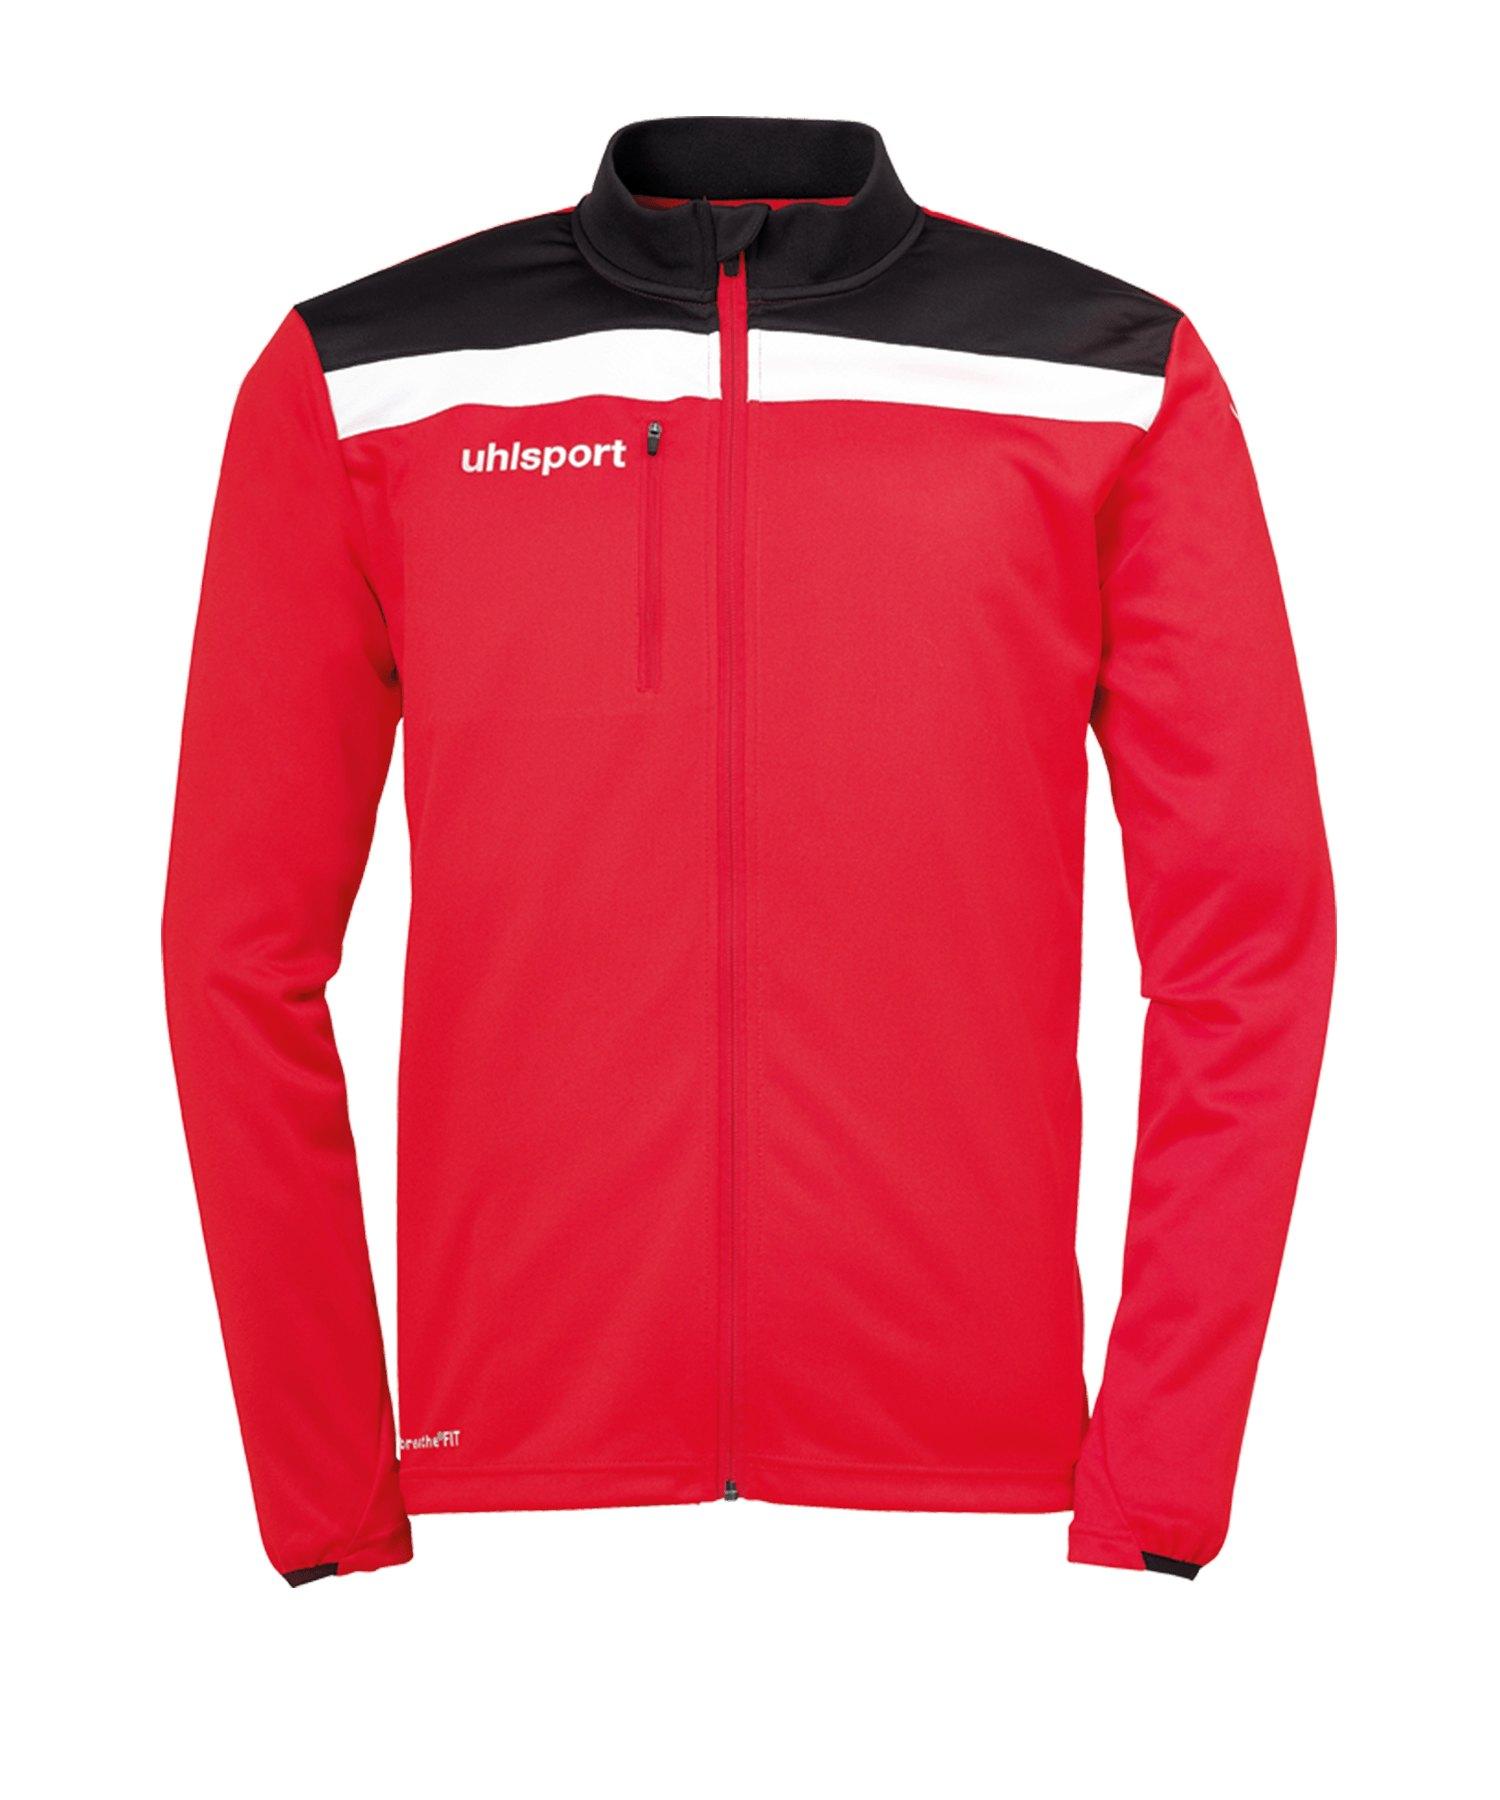 Uhlsport Offense 23 Trainingsjacke Rot Schwarz F04 - rot